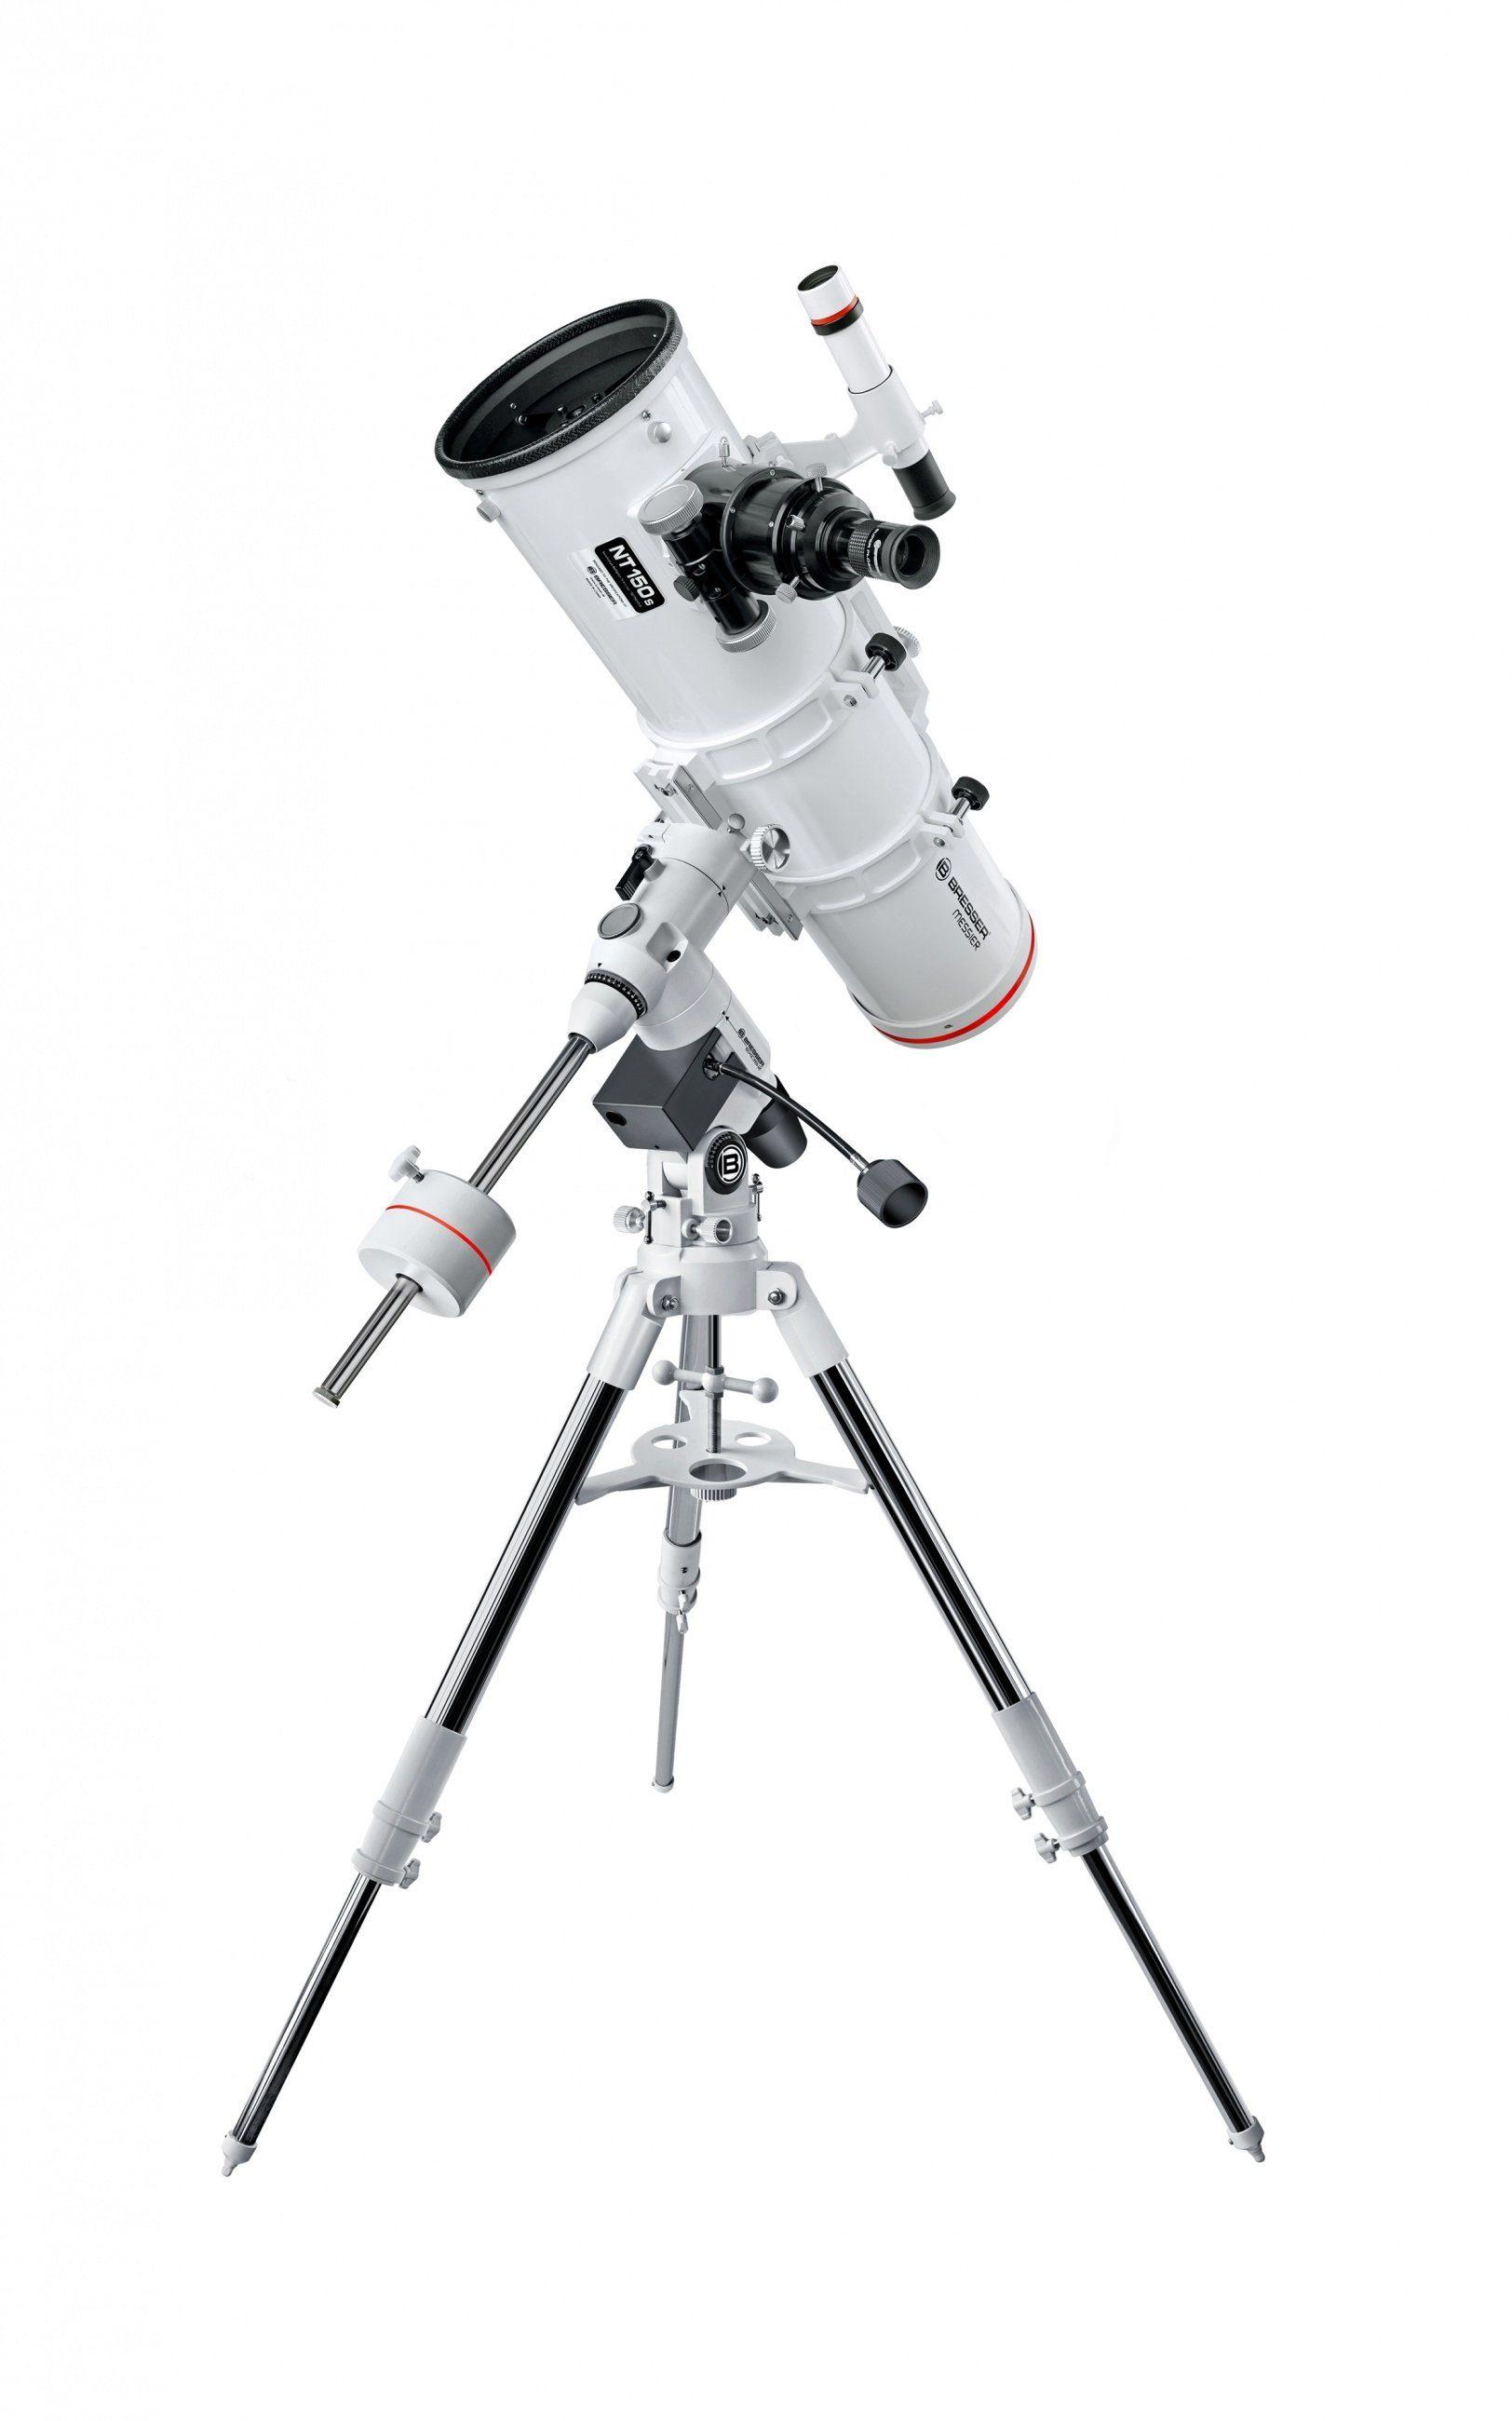 Bresser Teleskop »Messier NT-150S/750 Hexafoc EXOS-2/EQ5 Teleskop«